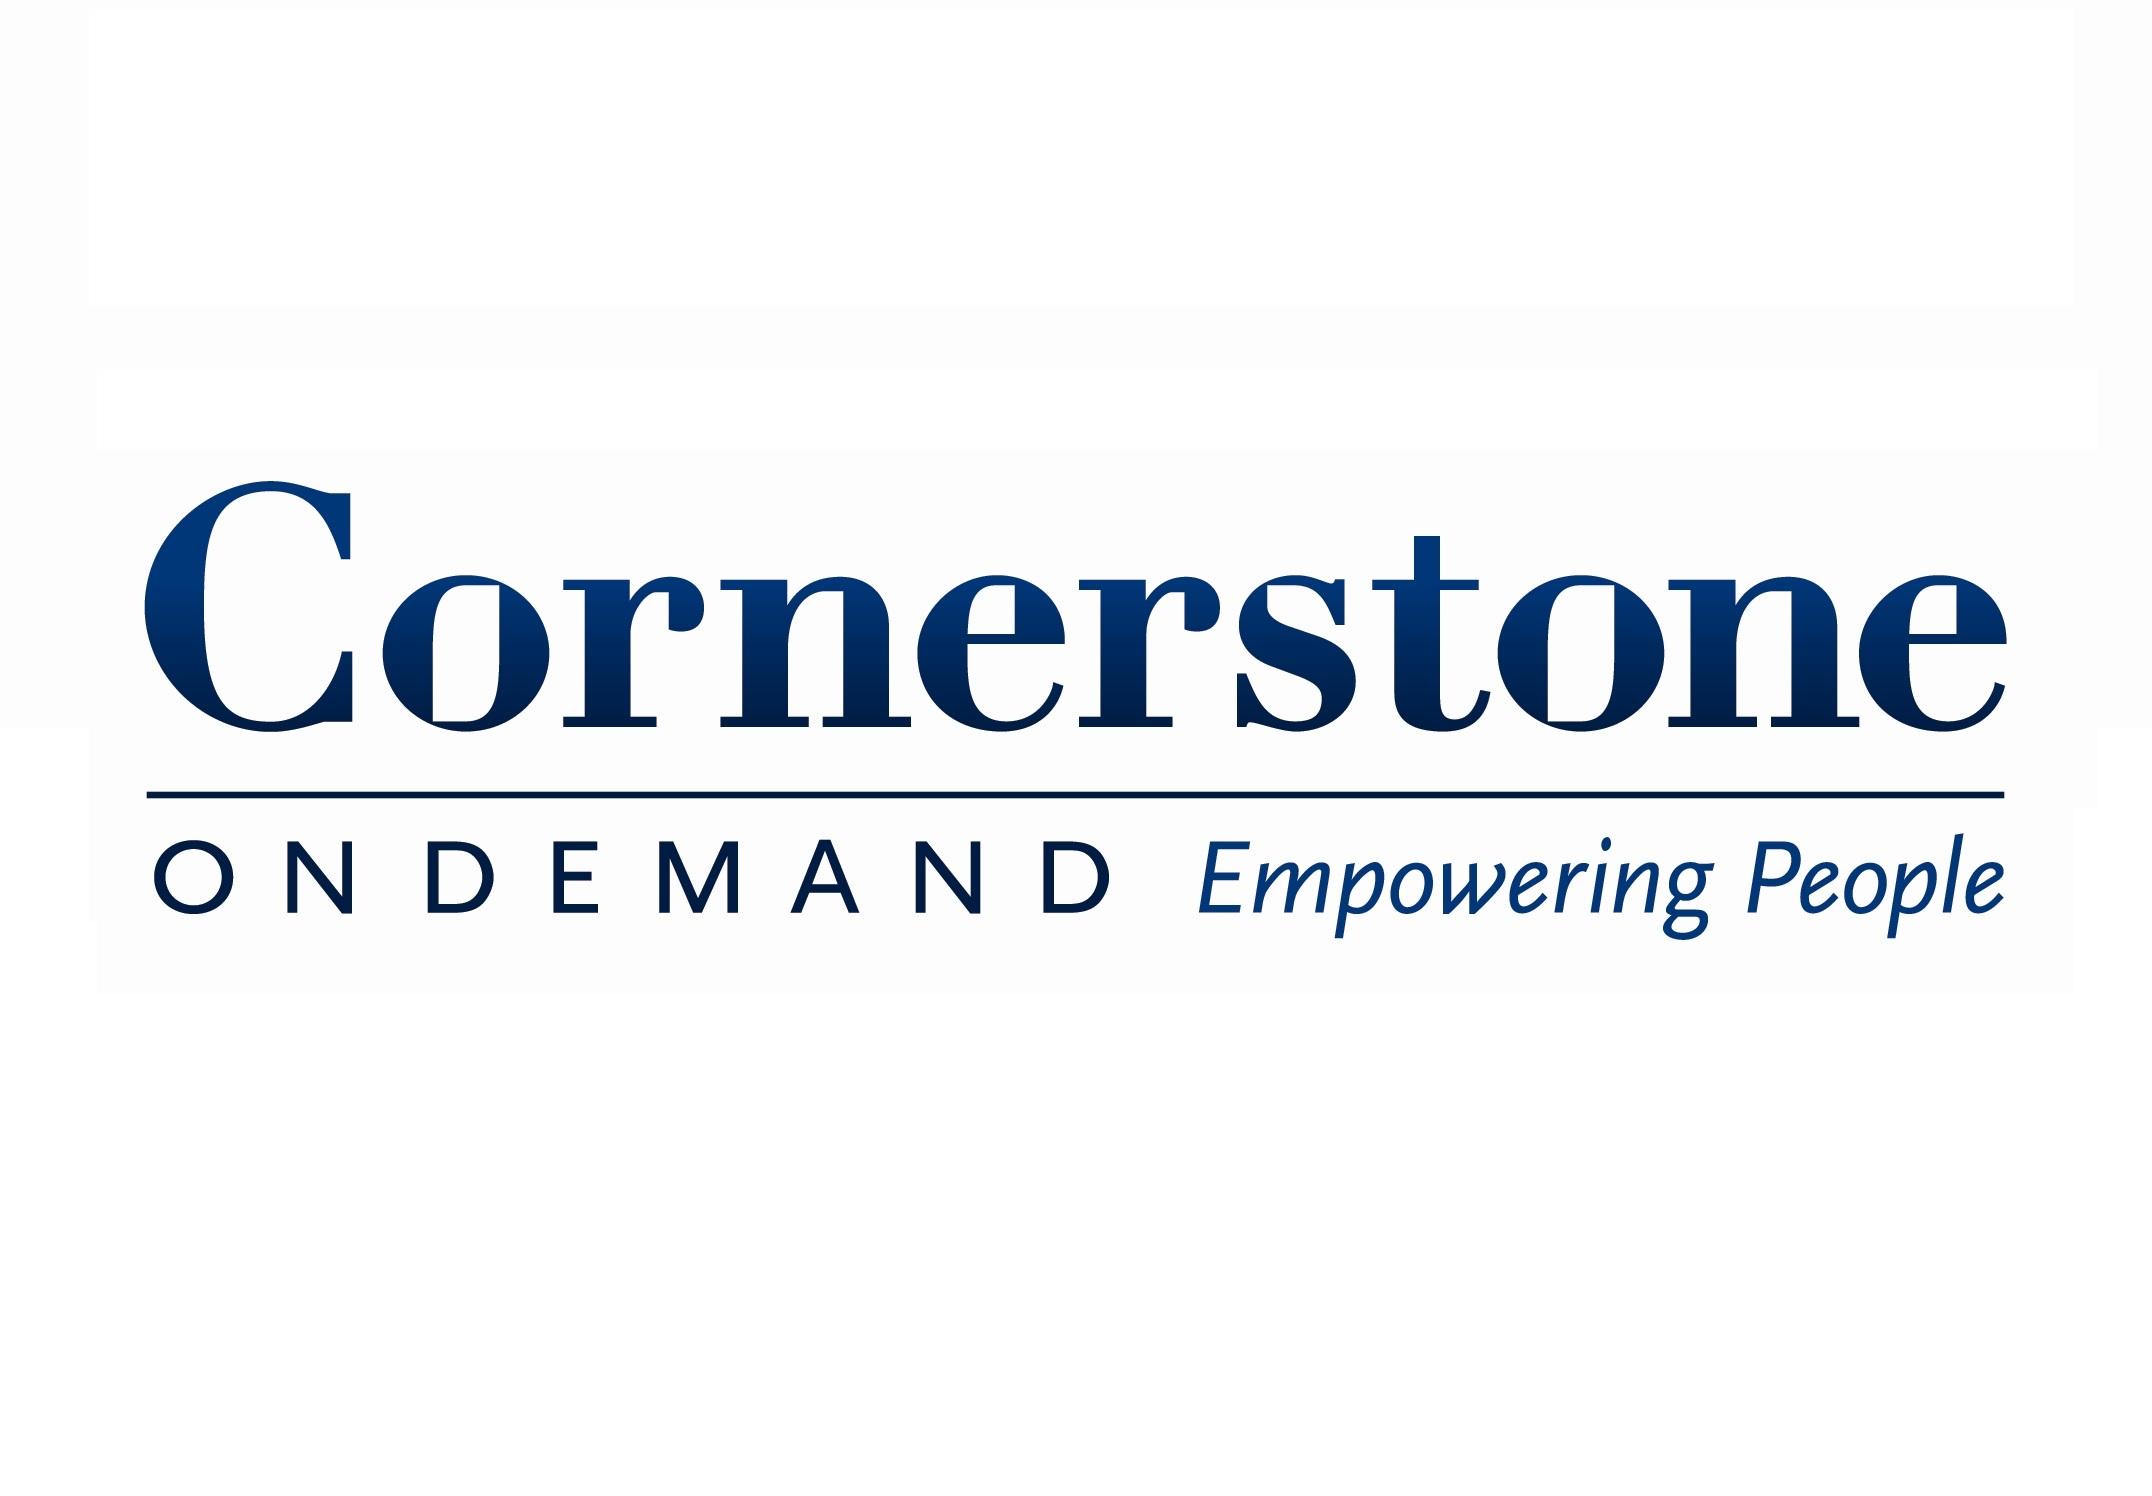 Cornerstone OnDemand Launches GDPR-Ready Initiative